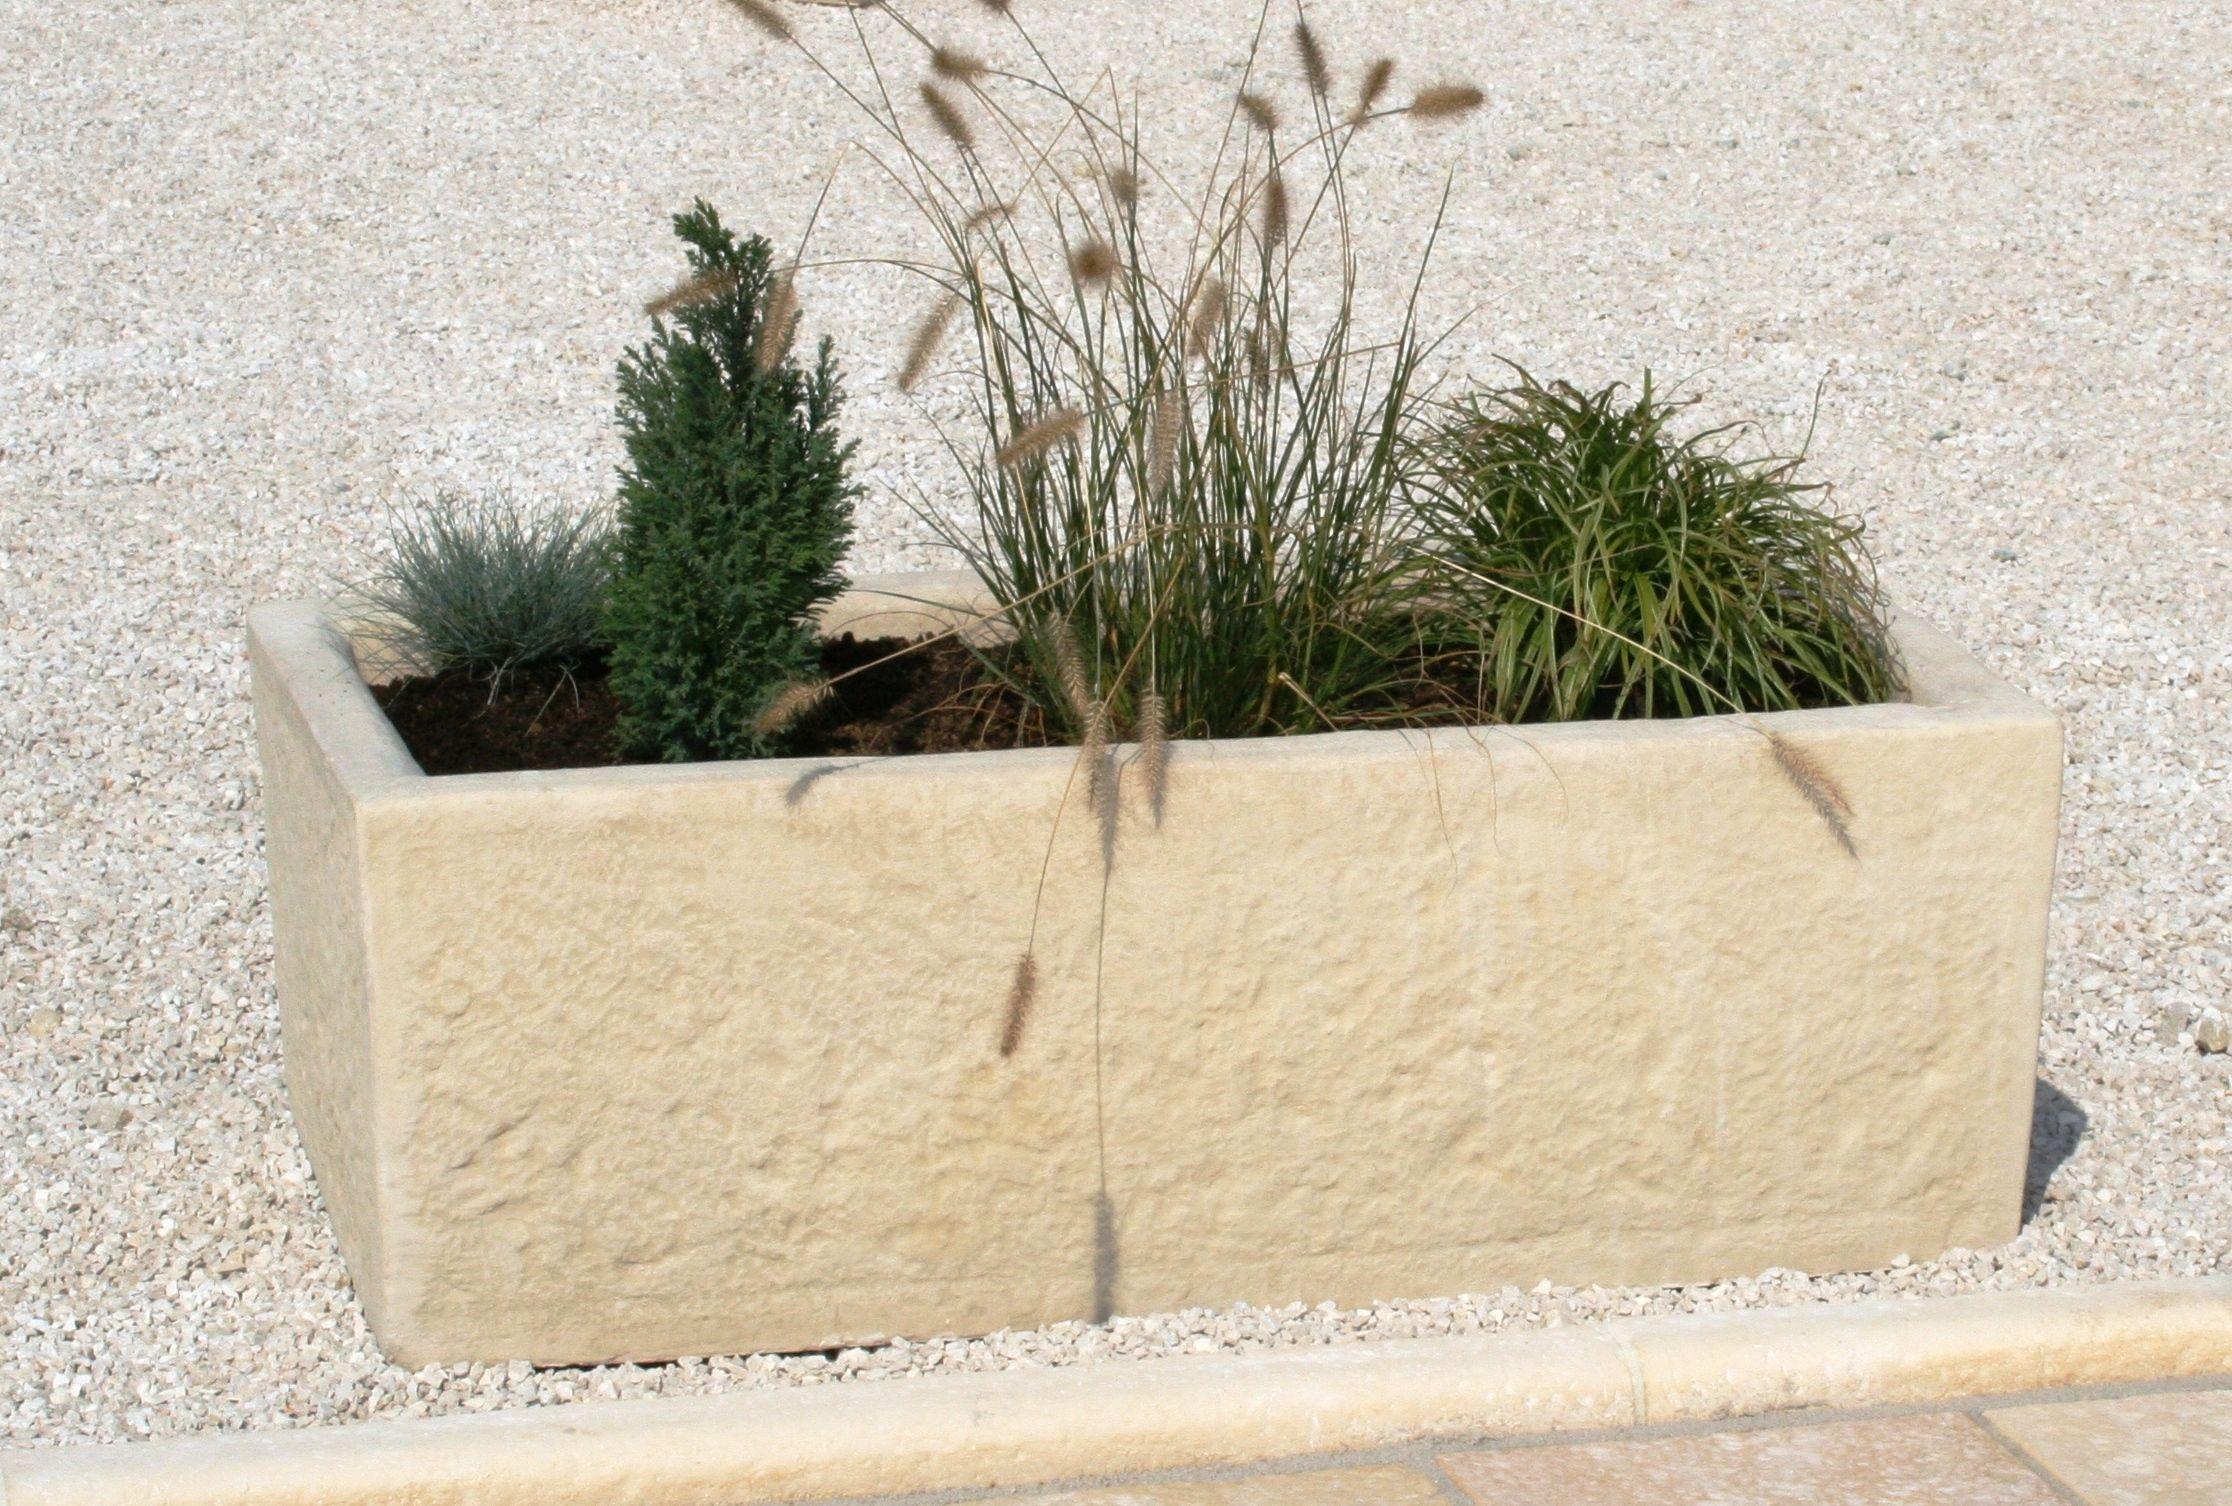 Auge jardini¨re ancienne imitation de la pierre taillée style